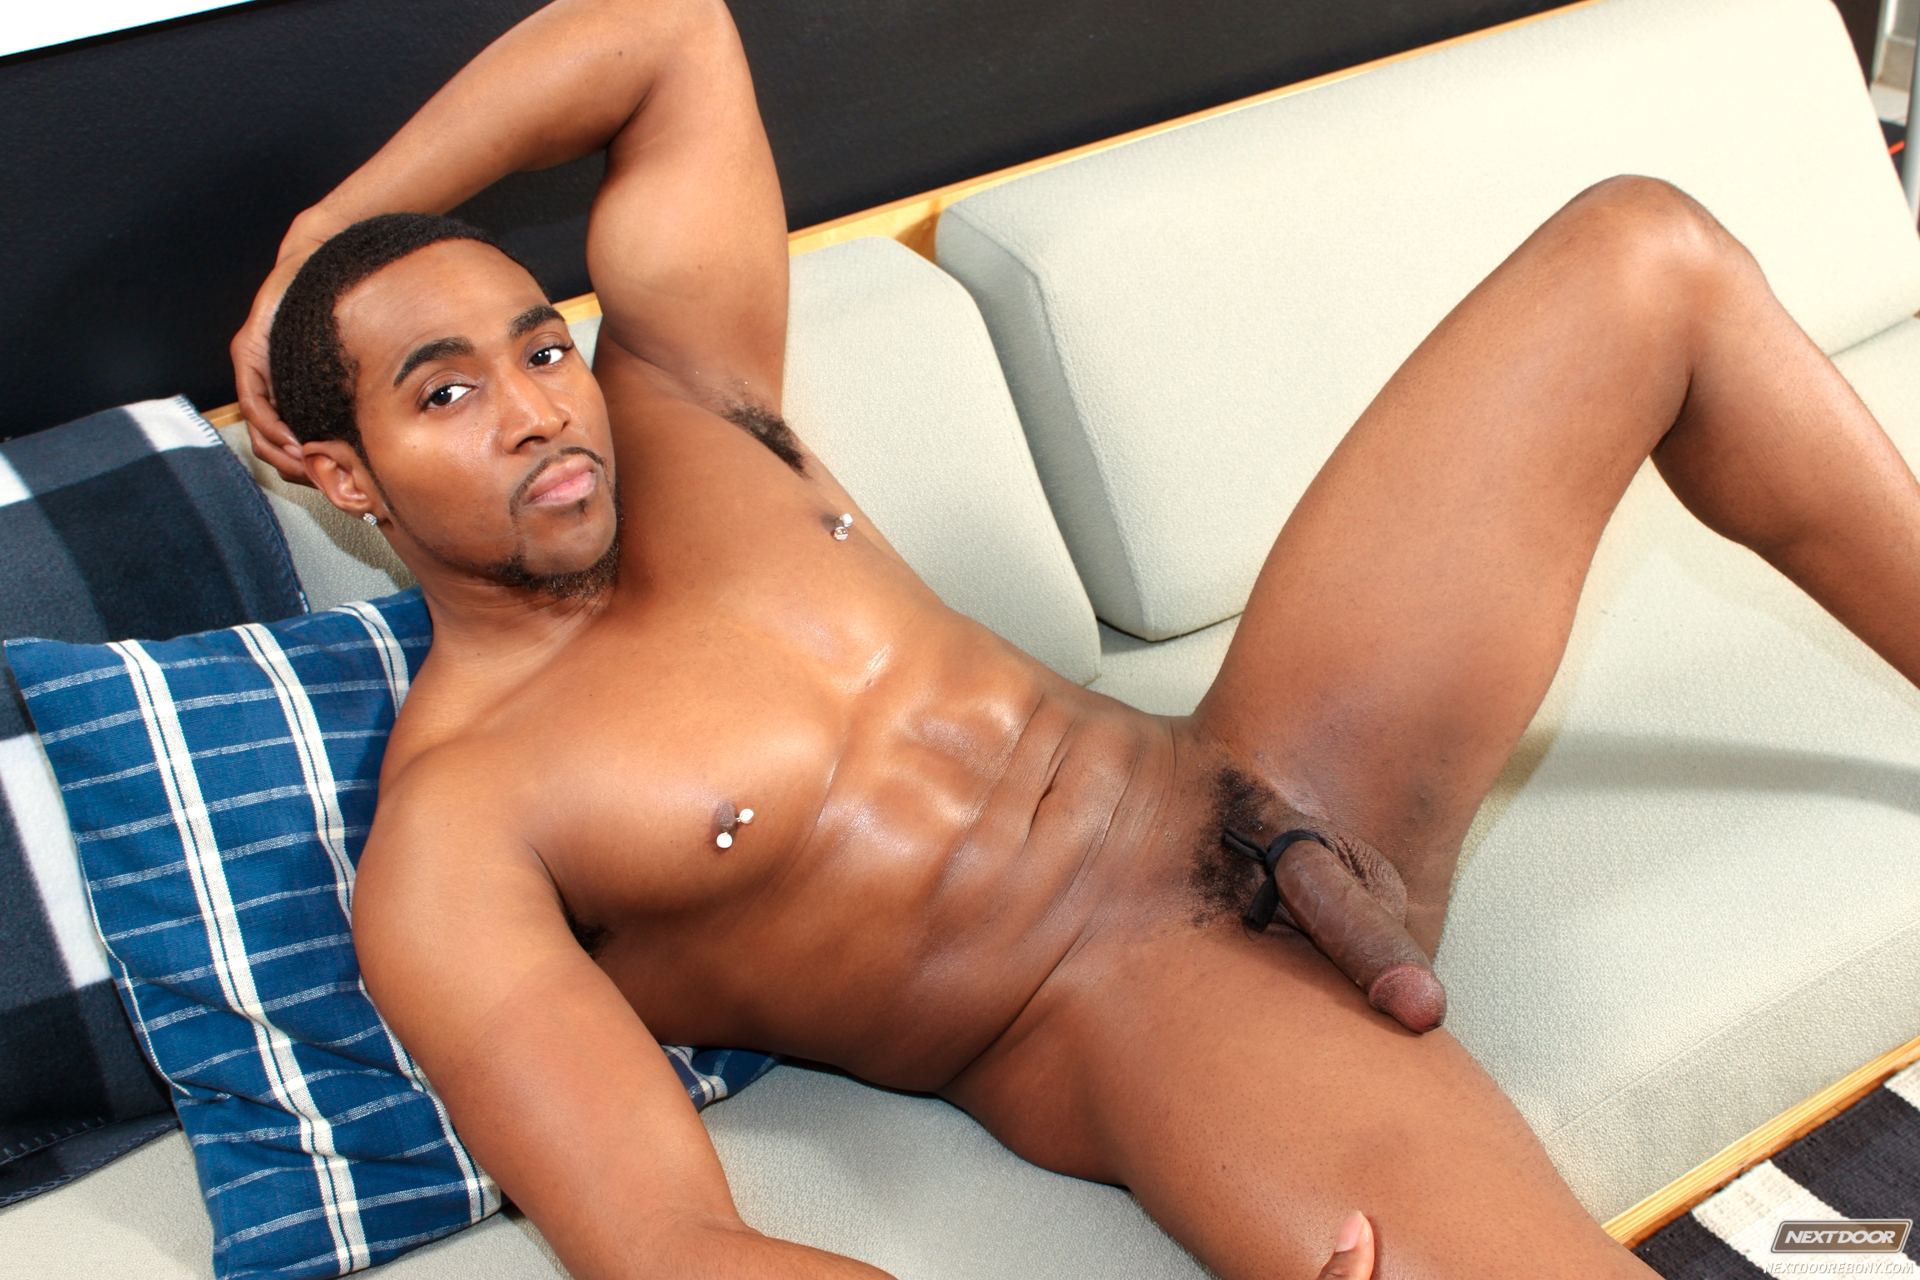 Gay fetish porn galleries